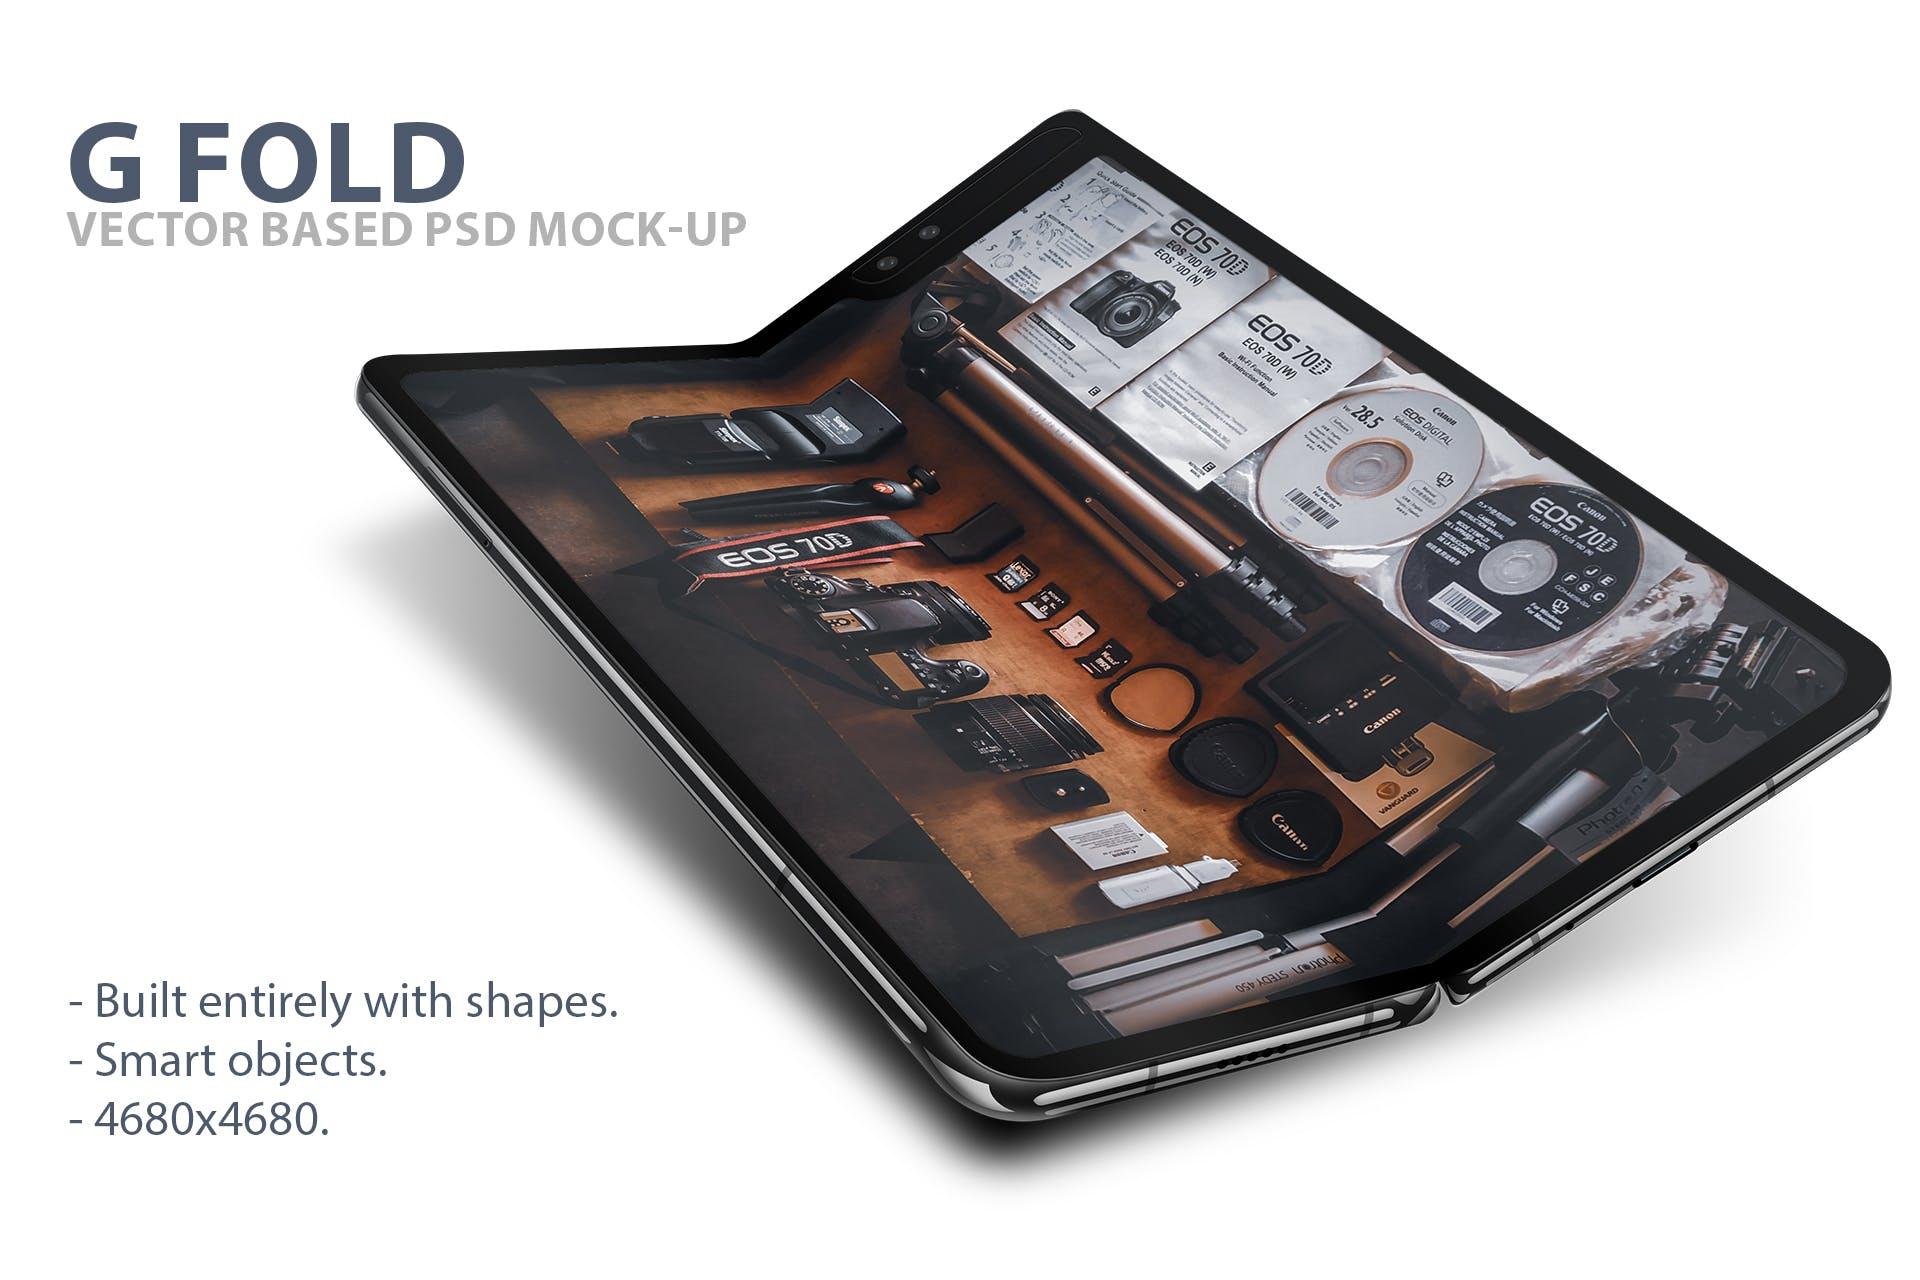 折叠智能手机PSD样机G Fold Smartphone PSD Mock-Ups